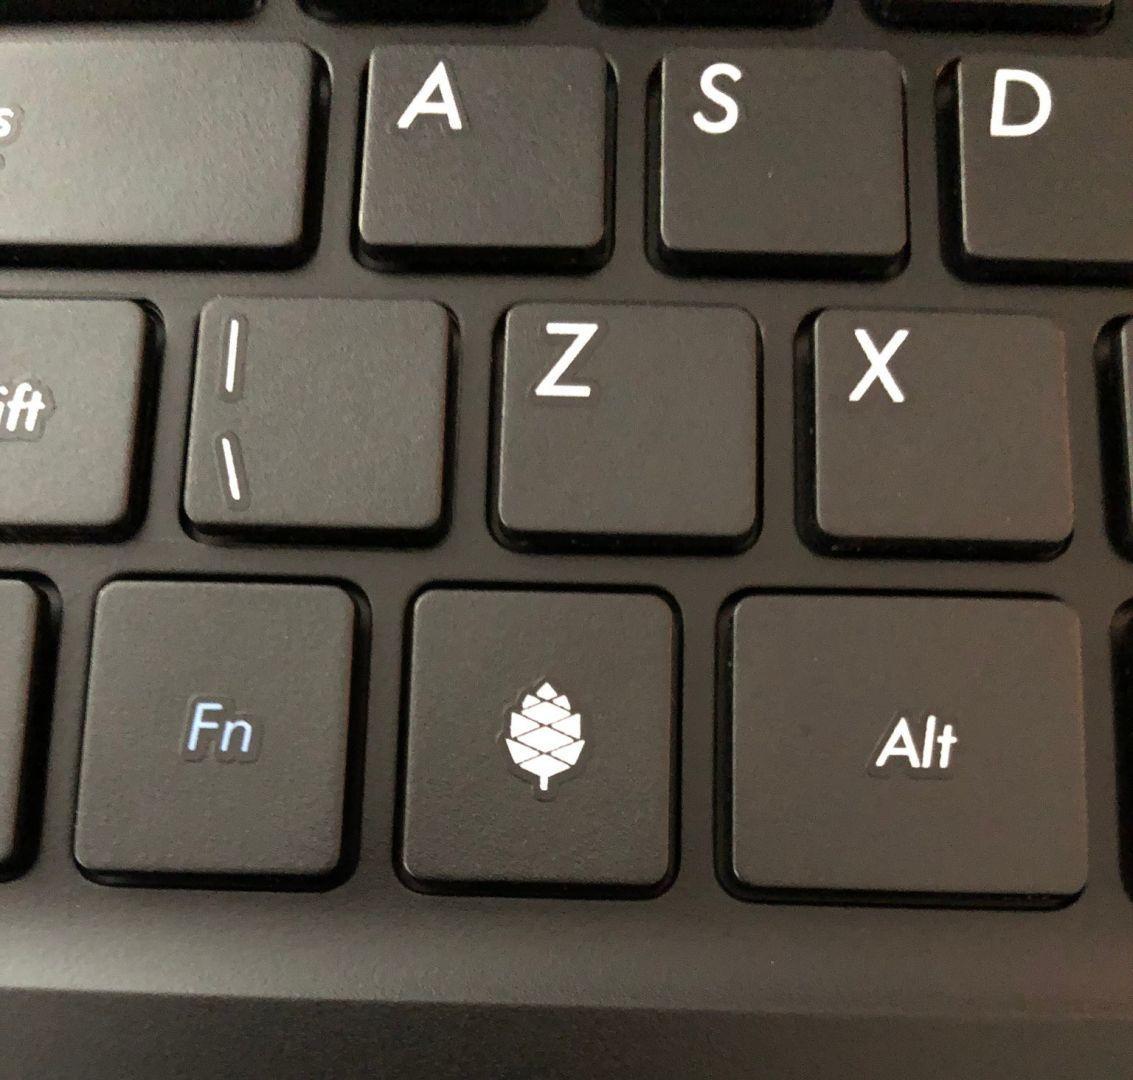 Pinebook Pro keyboard